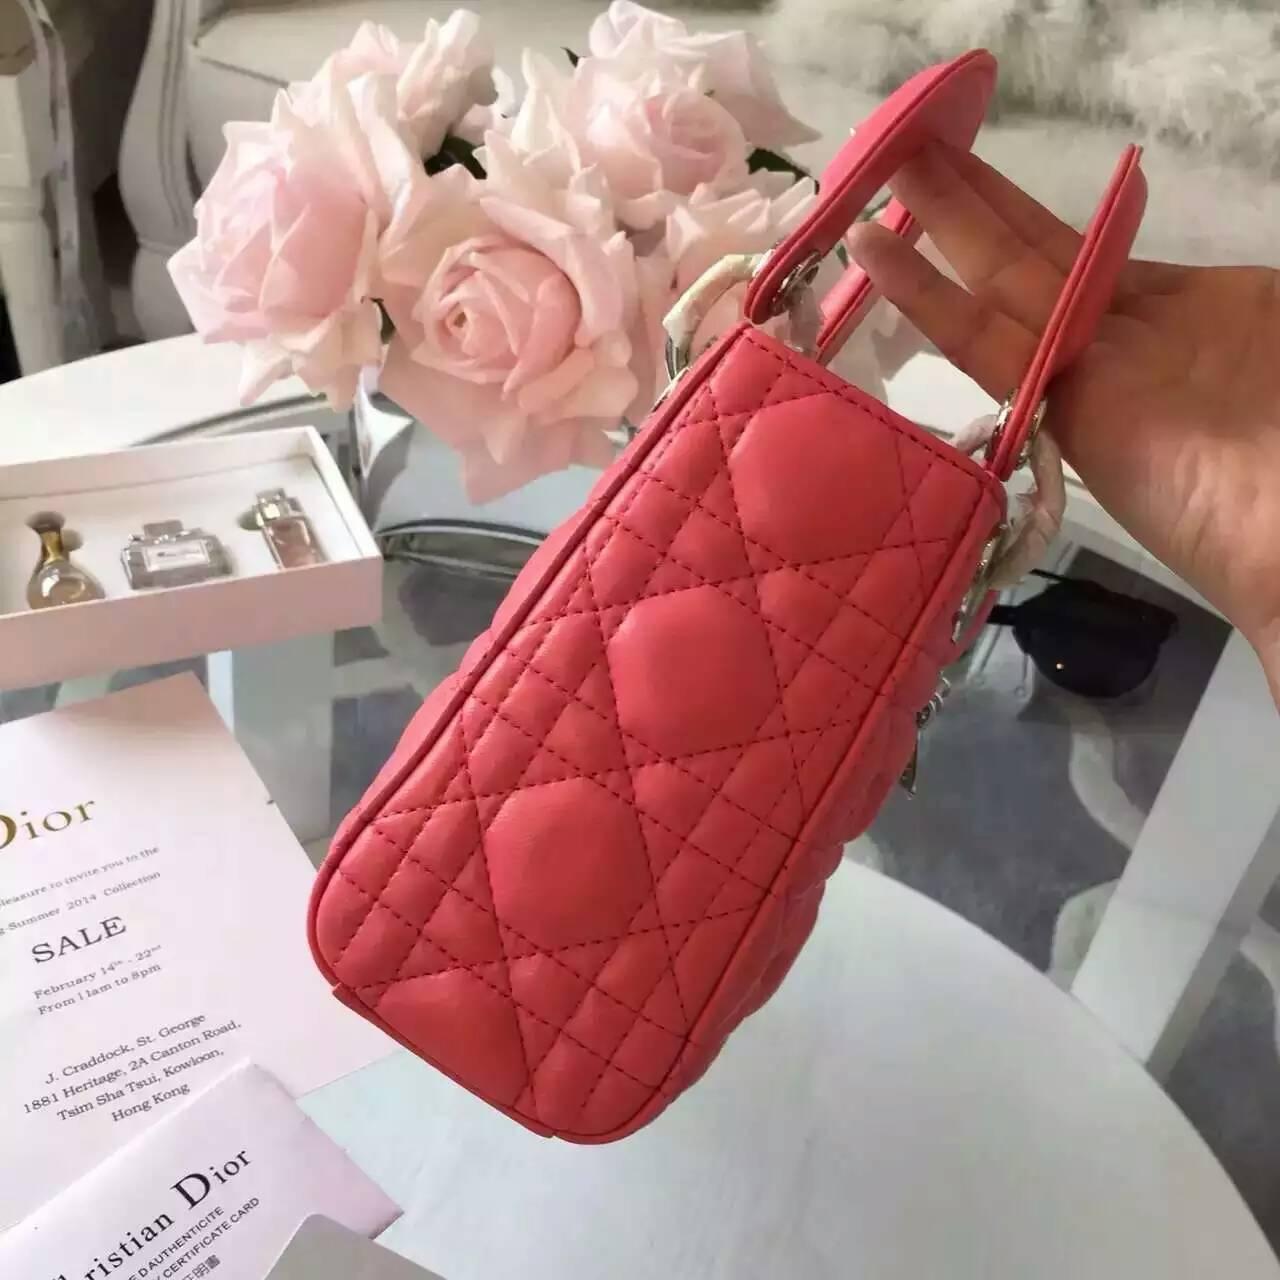 Dior包包官网 Lady Dior mini迪奥珊瑚红色顶级羊皮三格戴妃包17cm